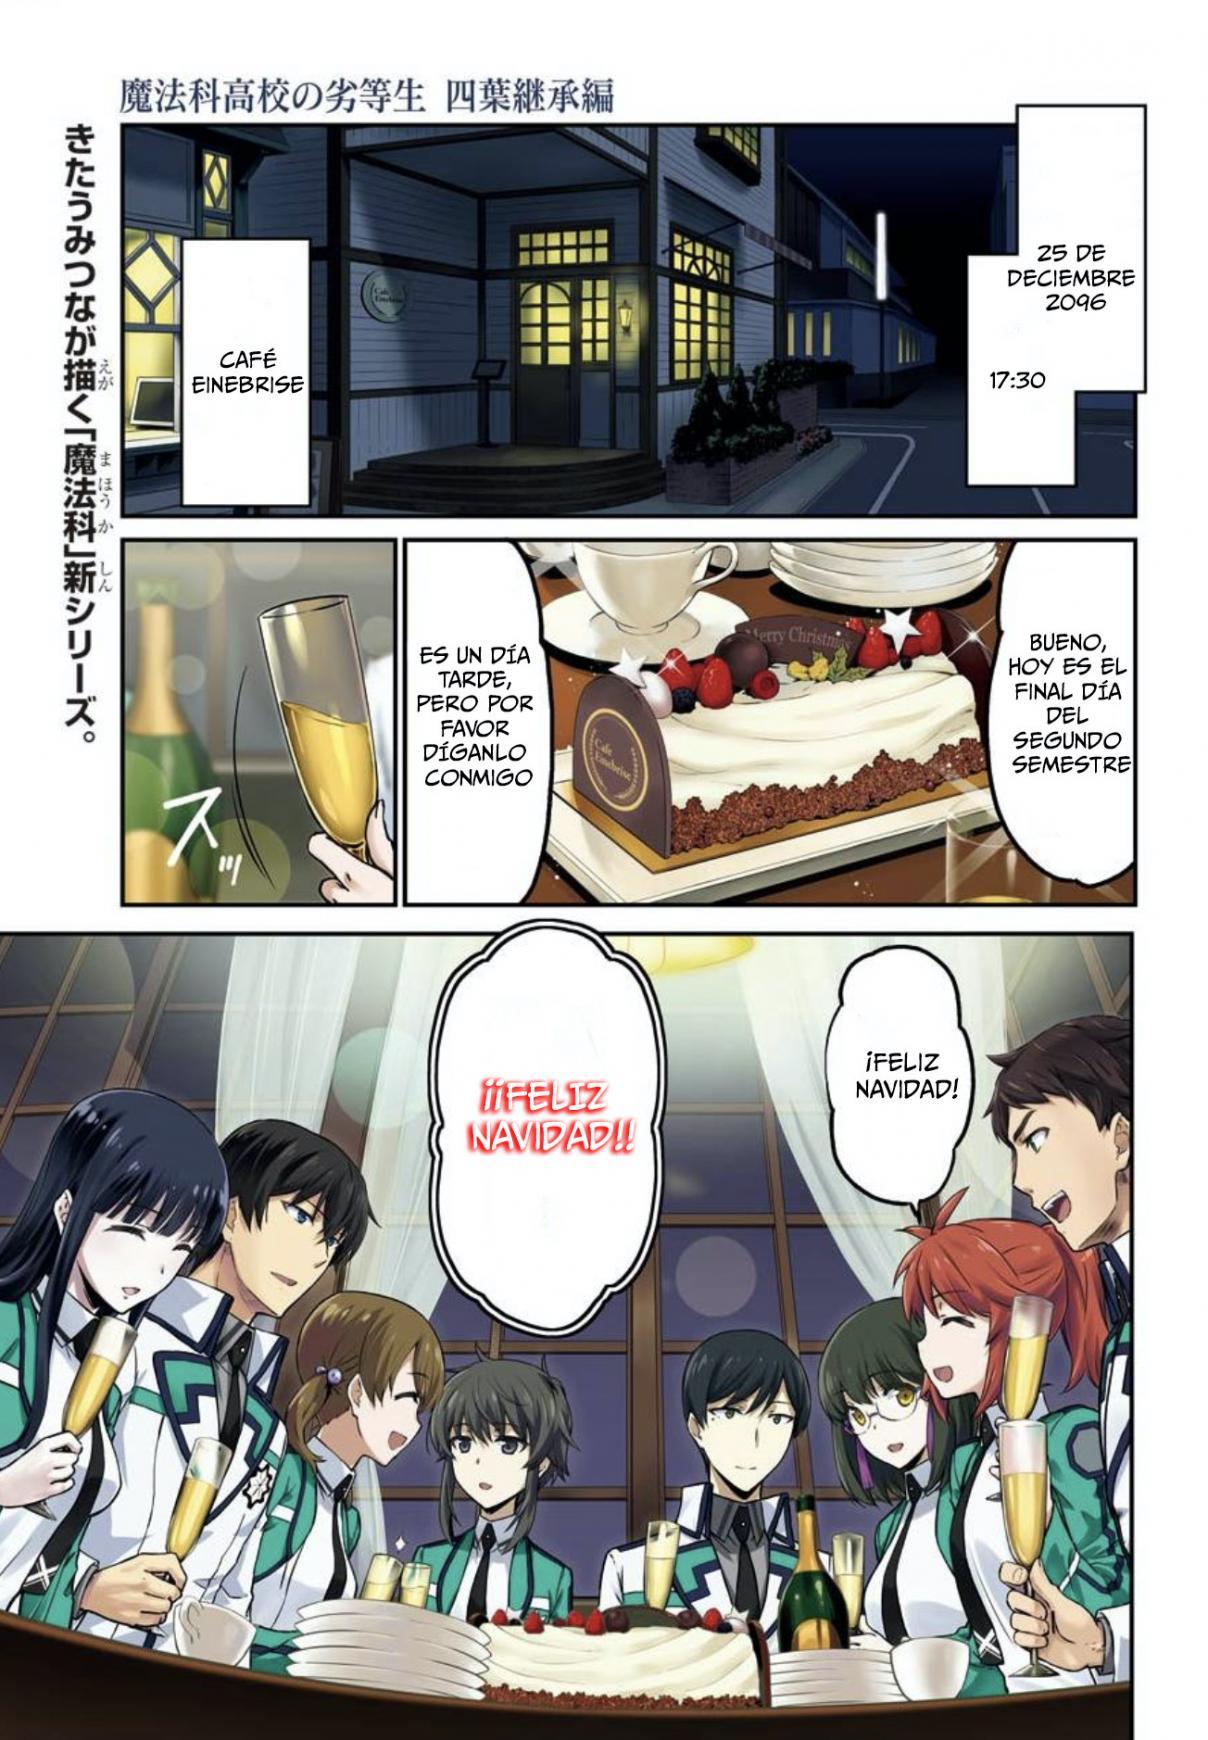 https://nine.mangadogs.com/es_manga/pic8/39/37159/958158/f5ebd52a0dc78551b072aa2eb23438b8.jpg Page 1